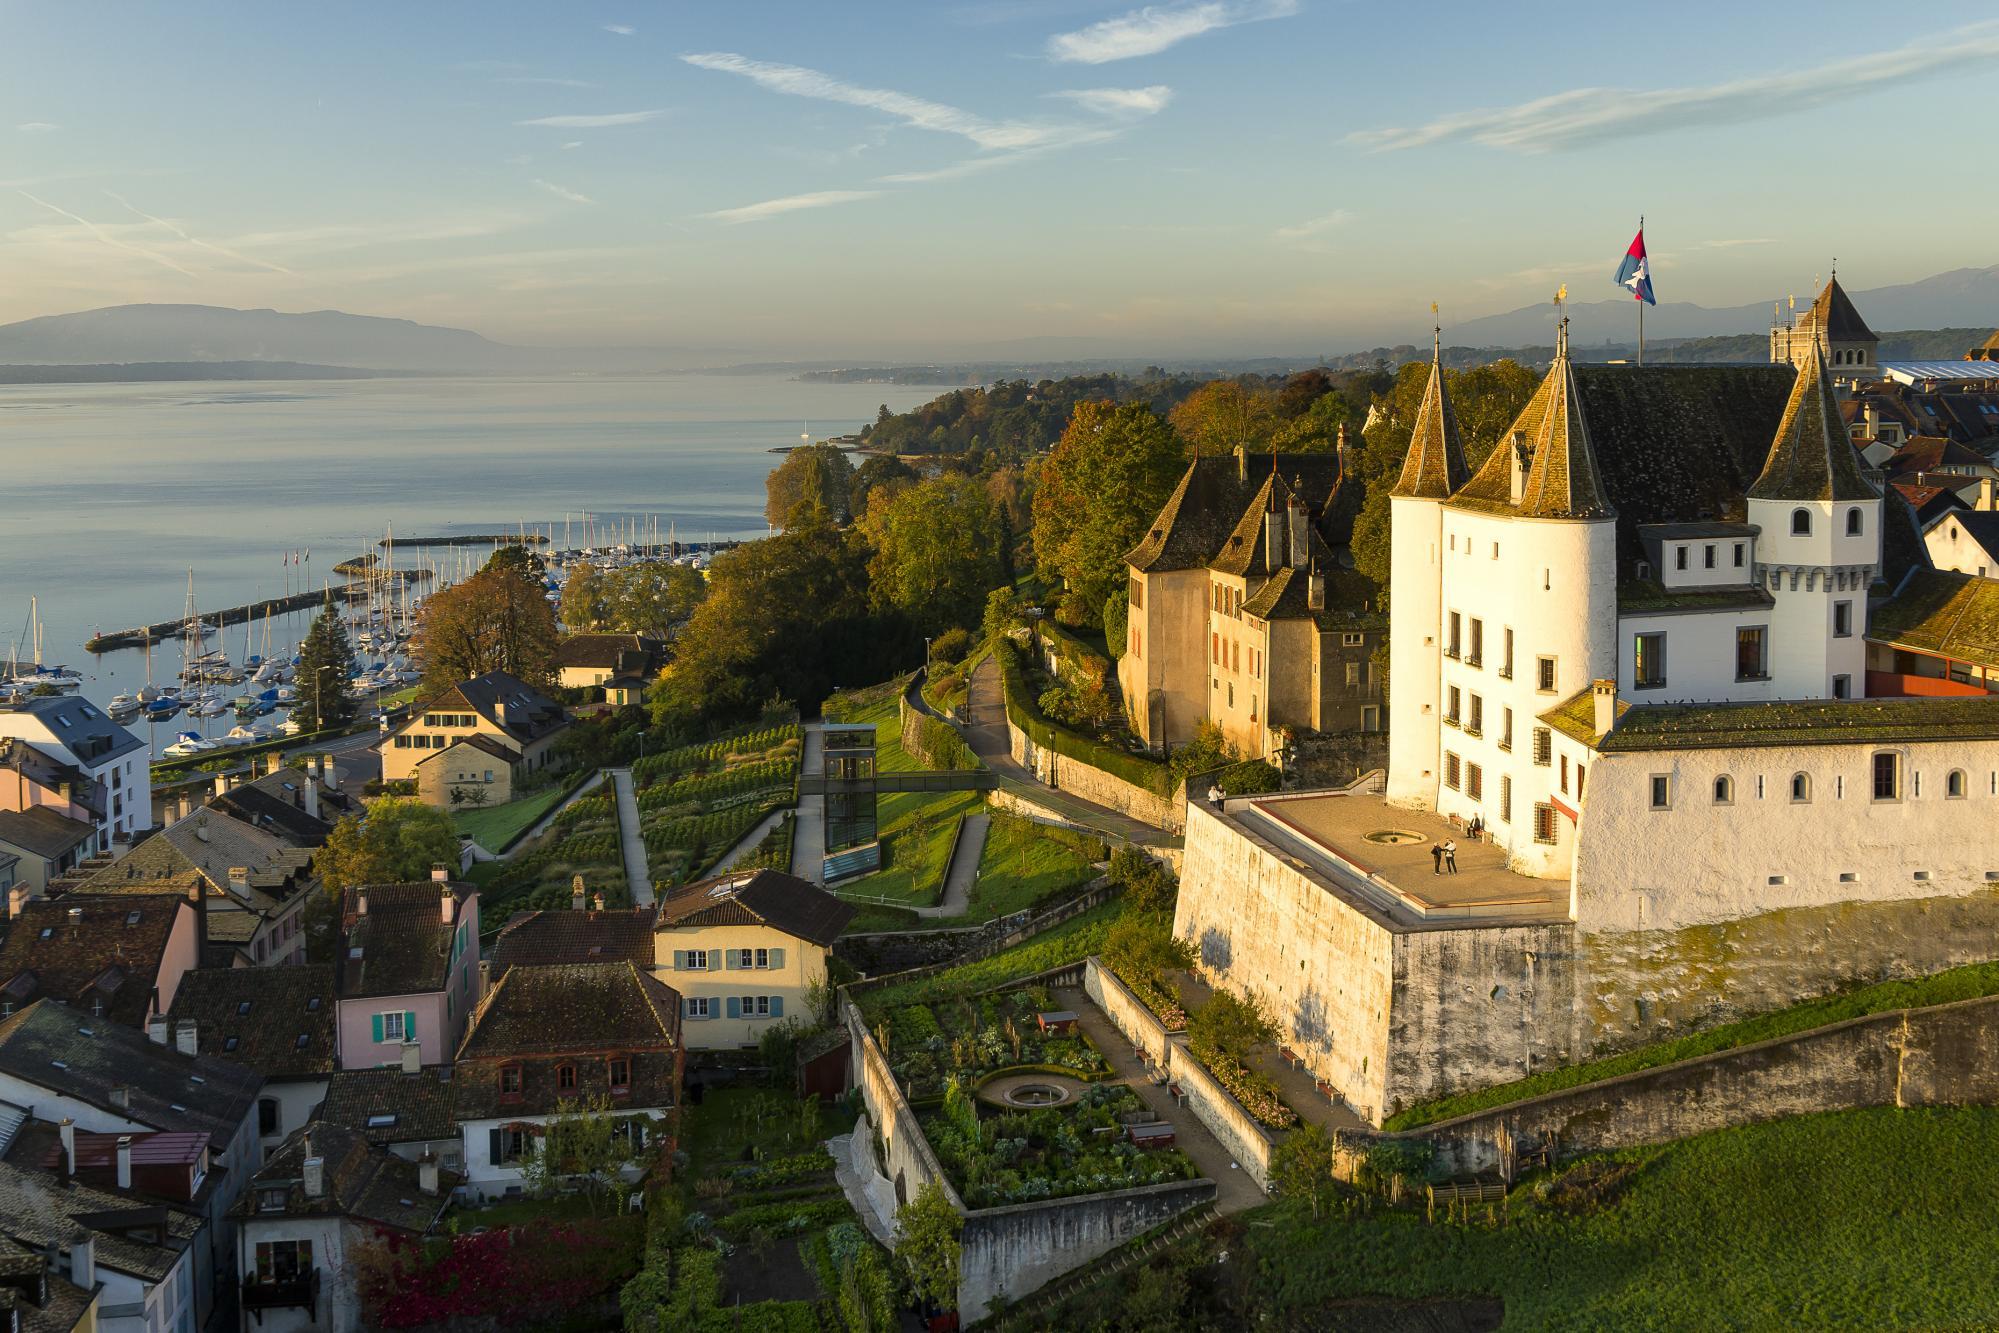 Город Монтрё | Montreux | Швейцария. Монтрё ...